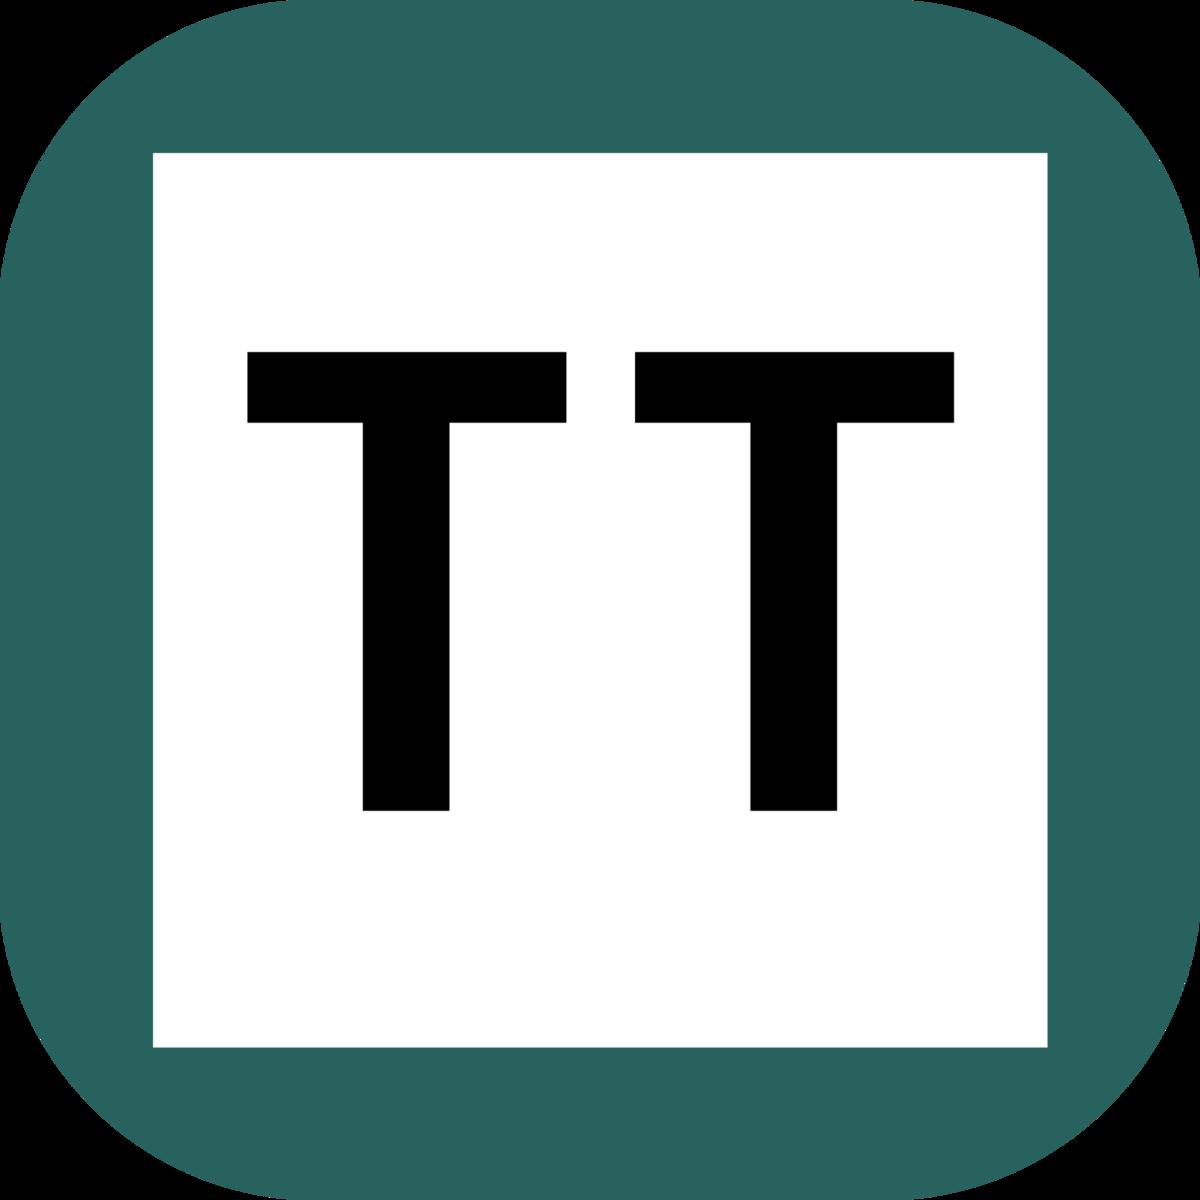 f:id:nashi-platform:20200615203819p:plain